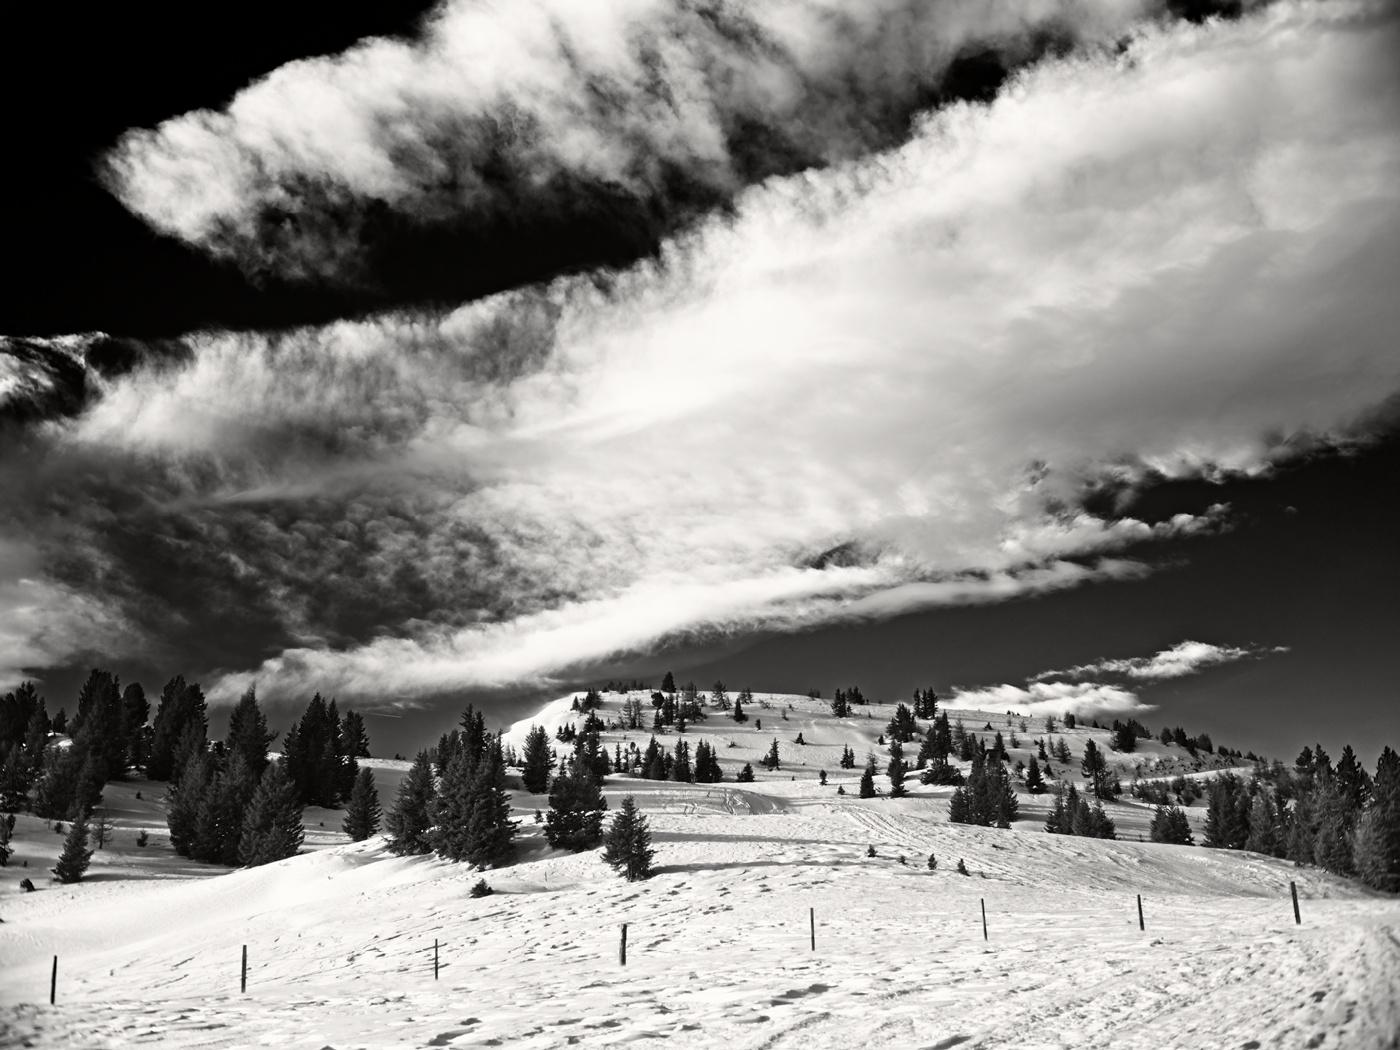 Skitour Frauenalpe Murau - Fujifilm GFX50 with Yashinon 50mm ƒ1/9